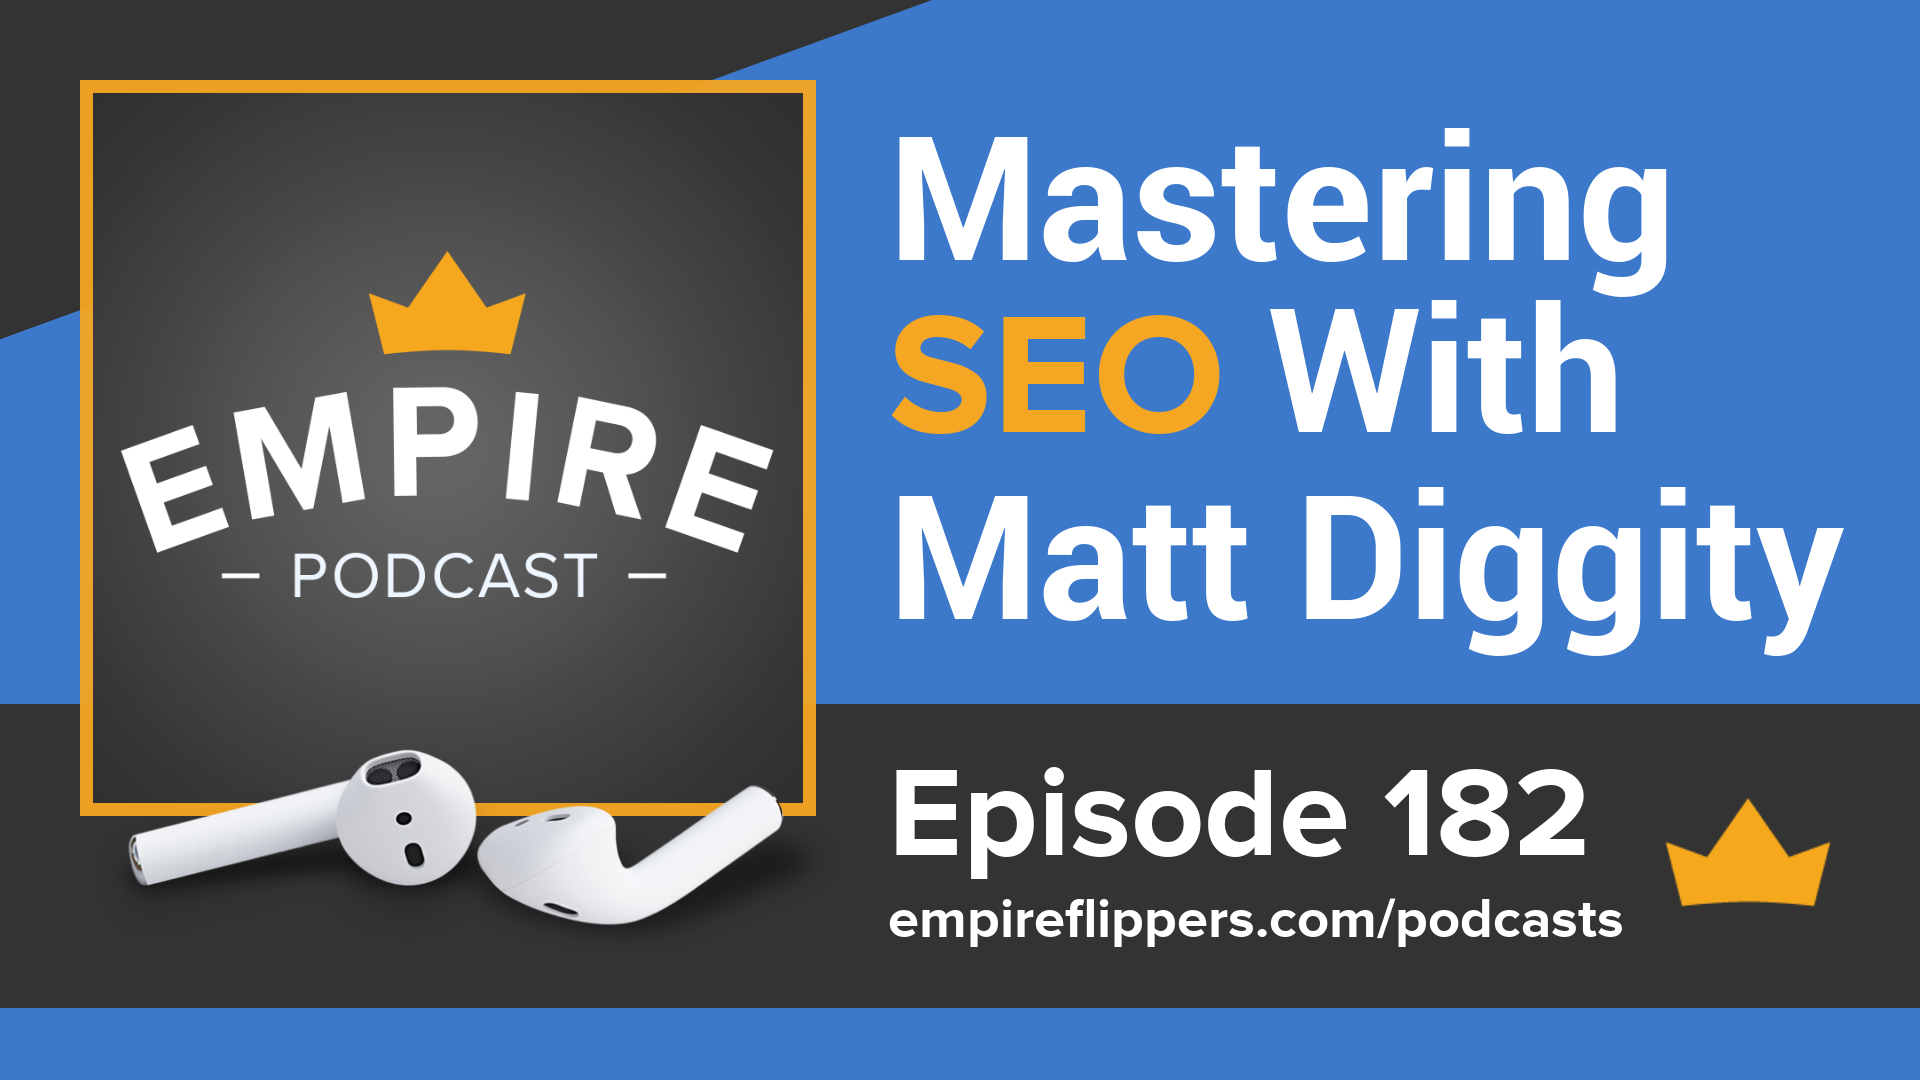 EFP 182 - Mastering SEO With Matt Diggity